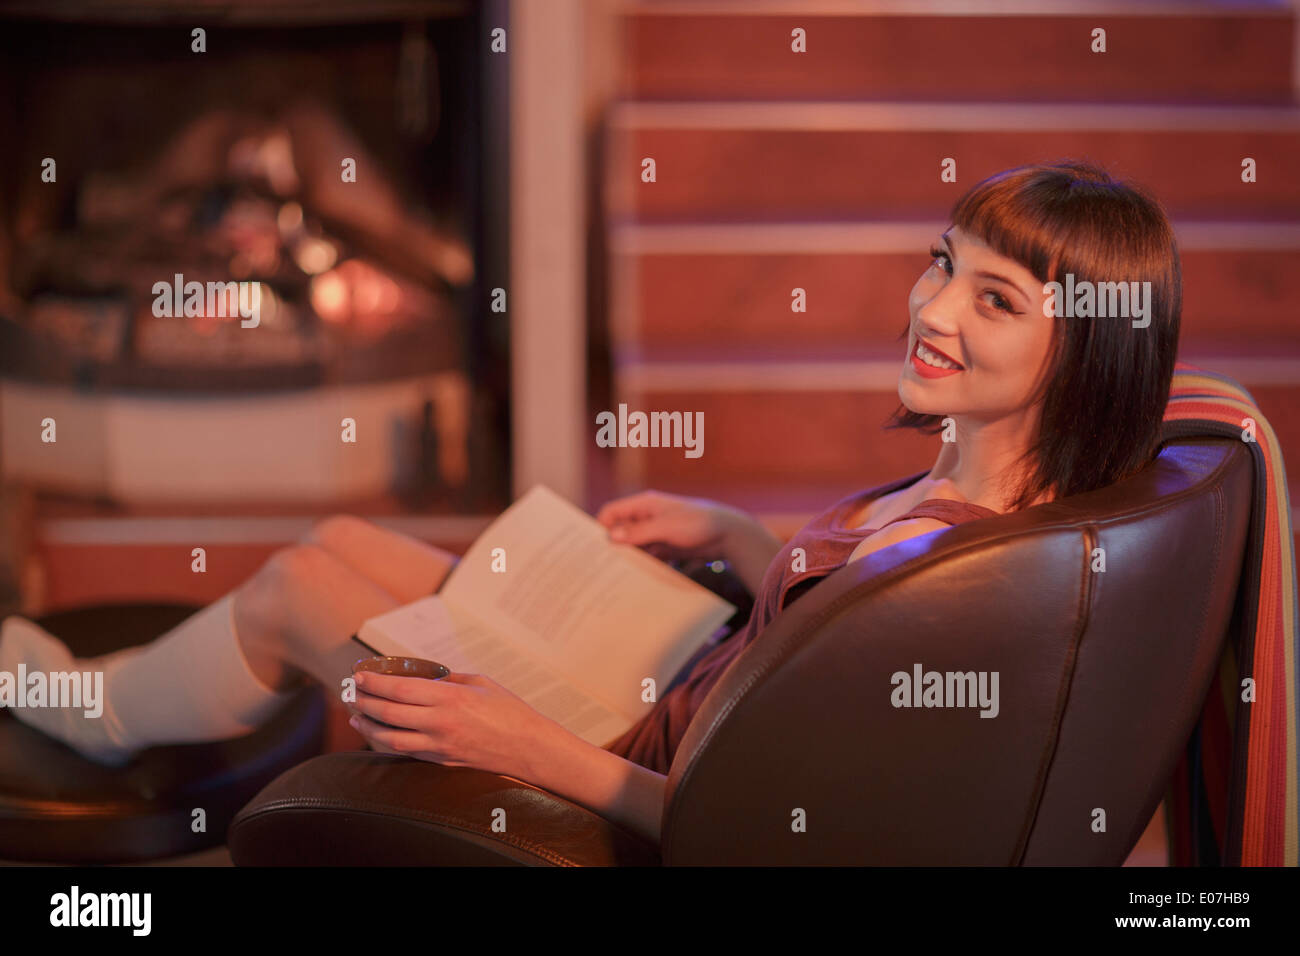 Joven Mujer sentada en un sillón leyendo un libro Imagen De Stock